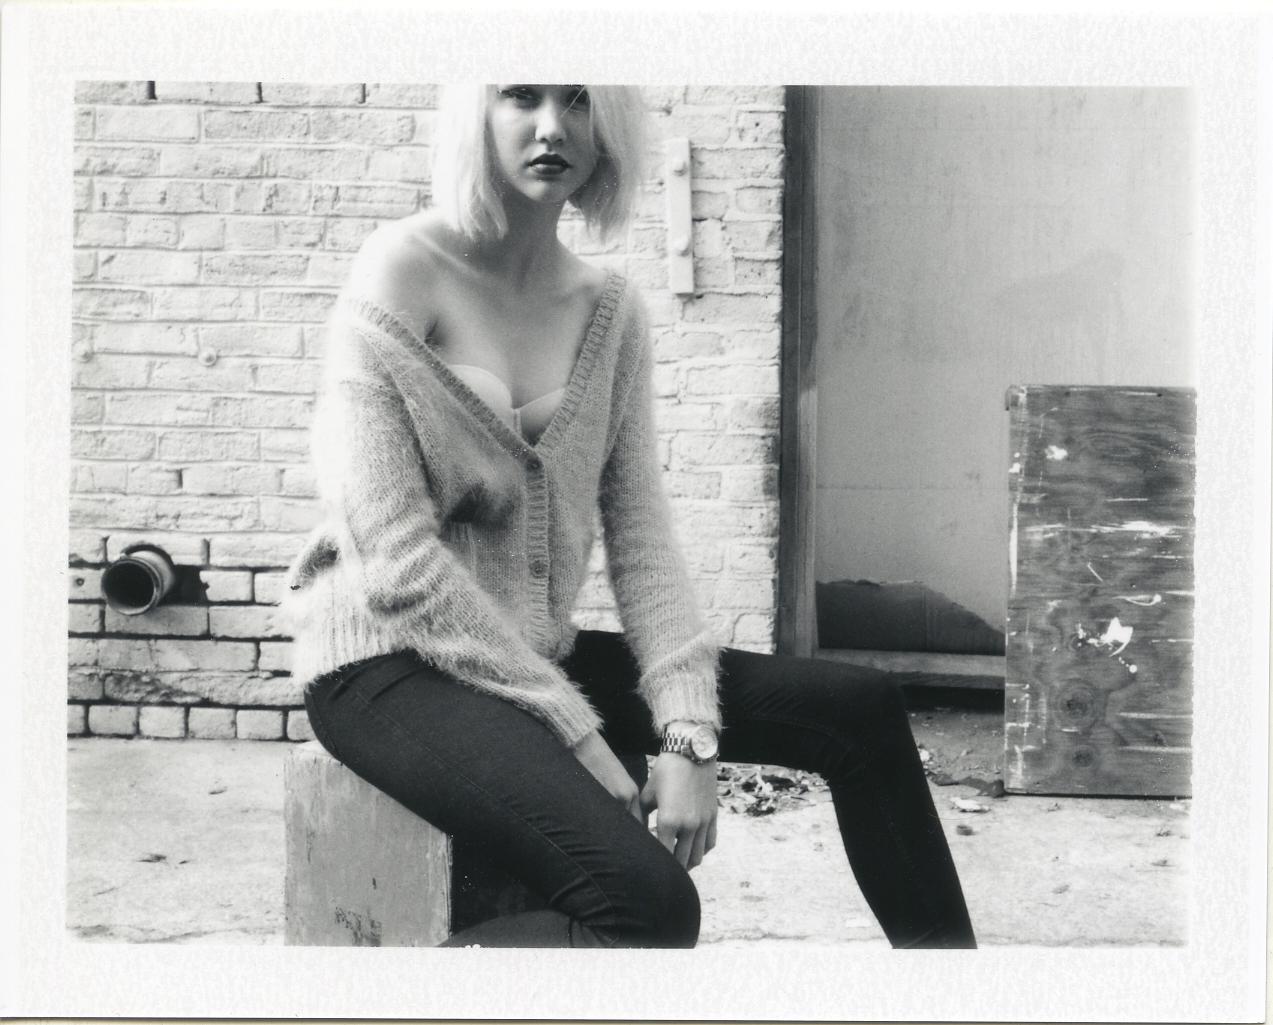 lily_polaroid002.jpg